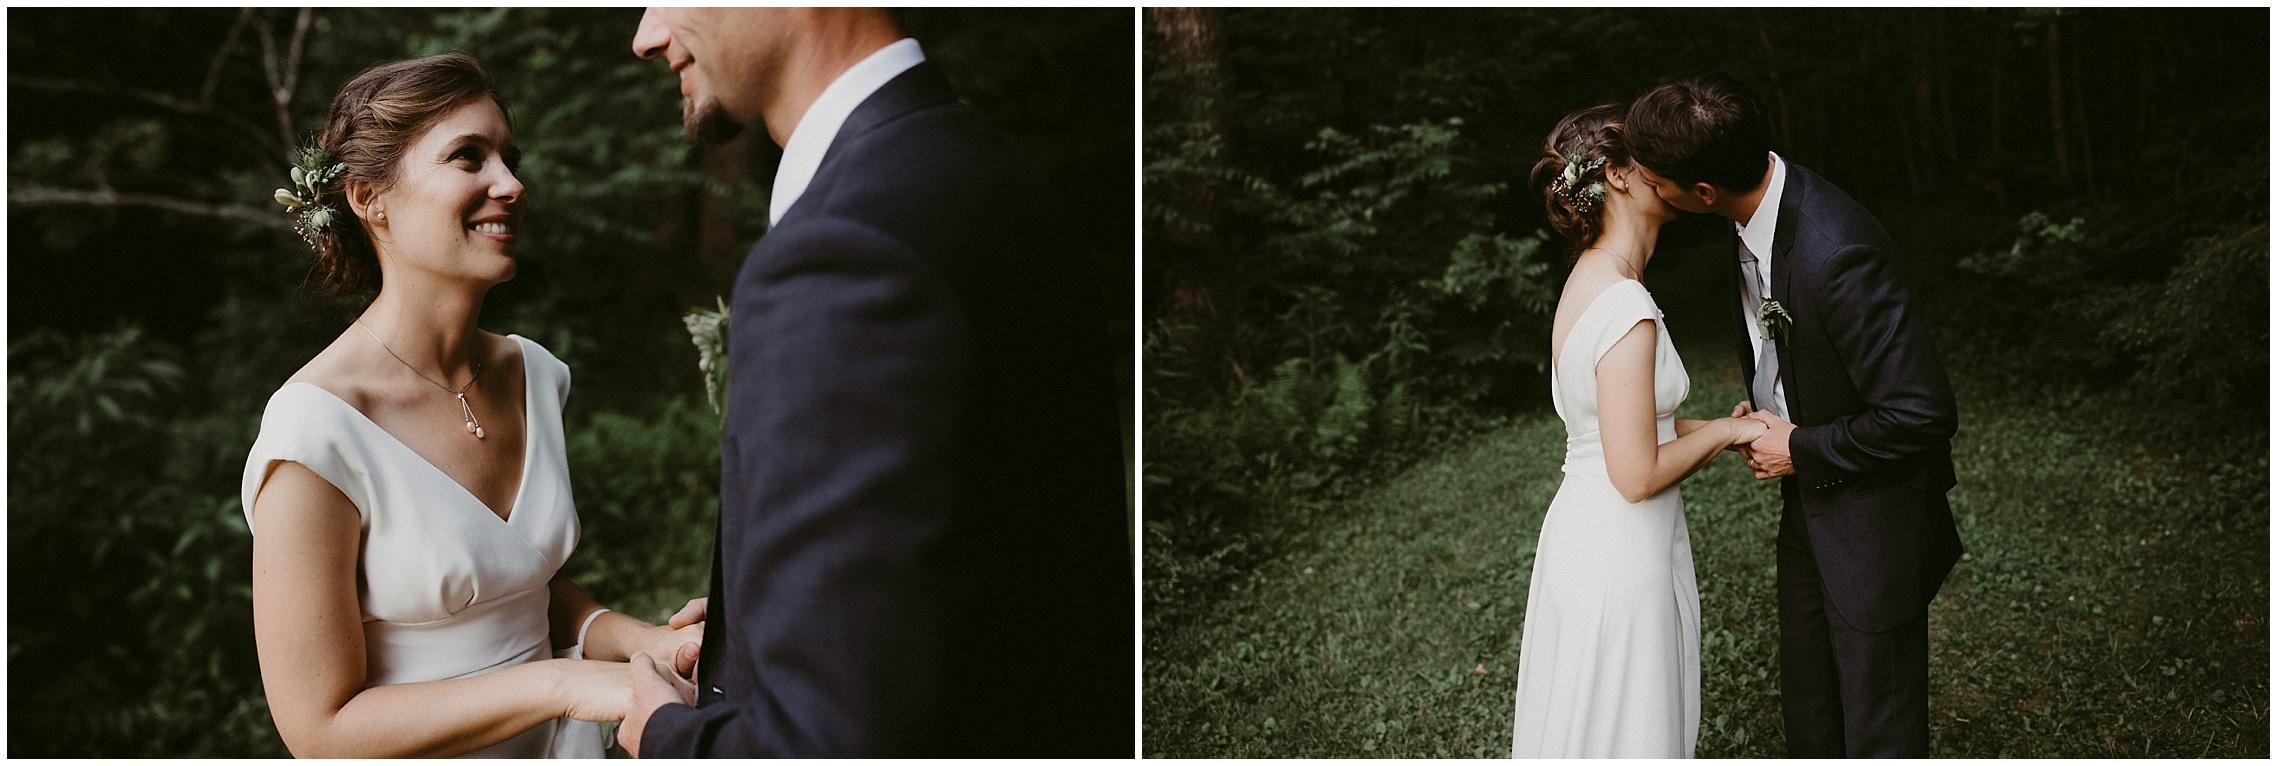 rock_creek_gardens_washington_wedding_photographer_0350.jpg